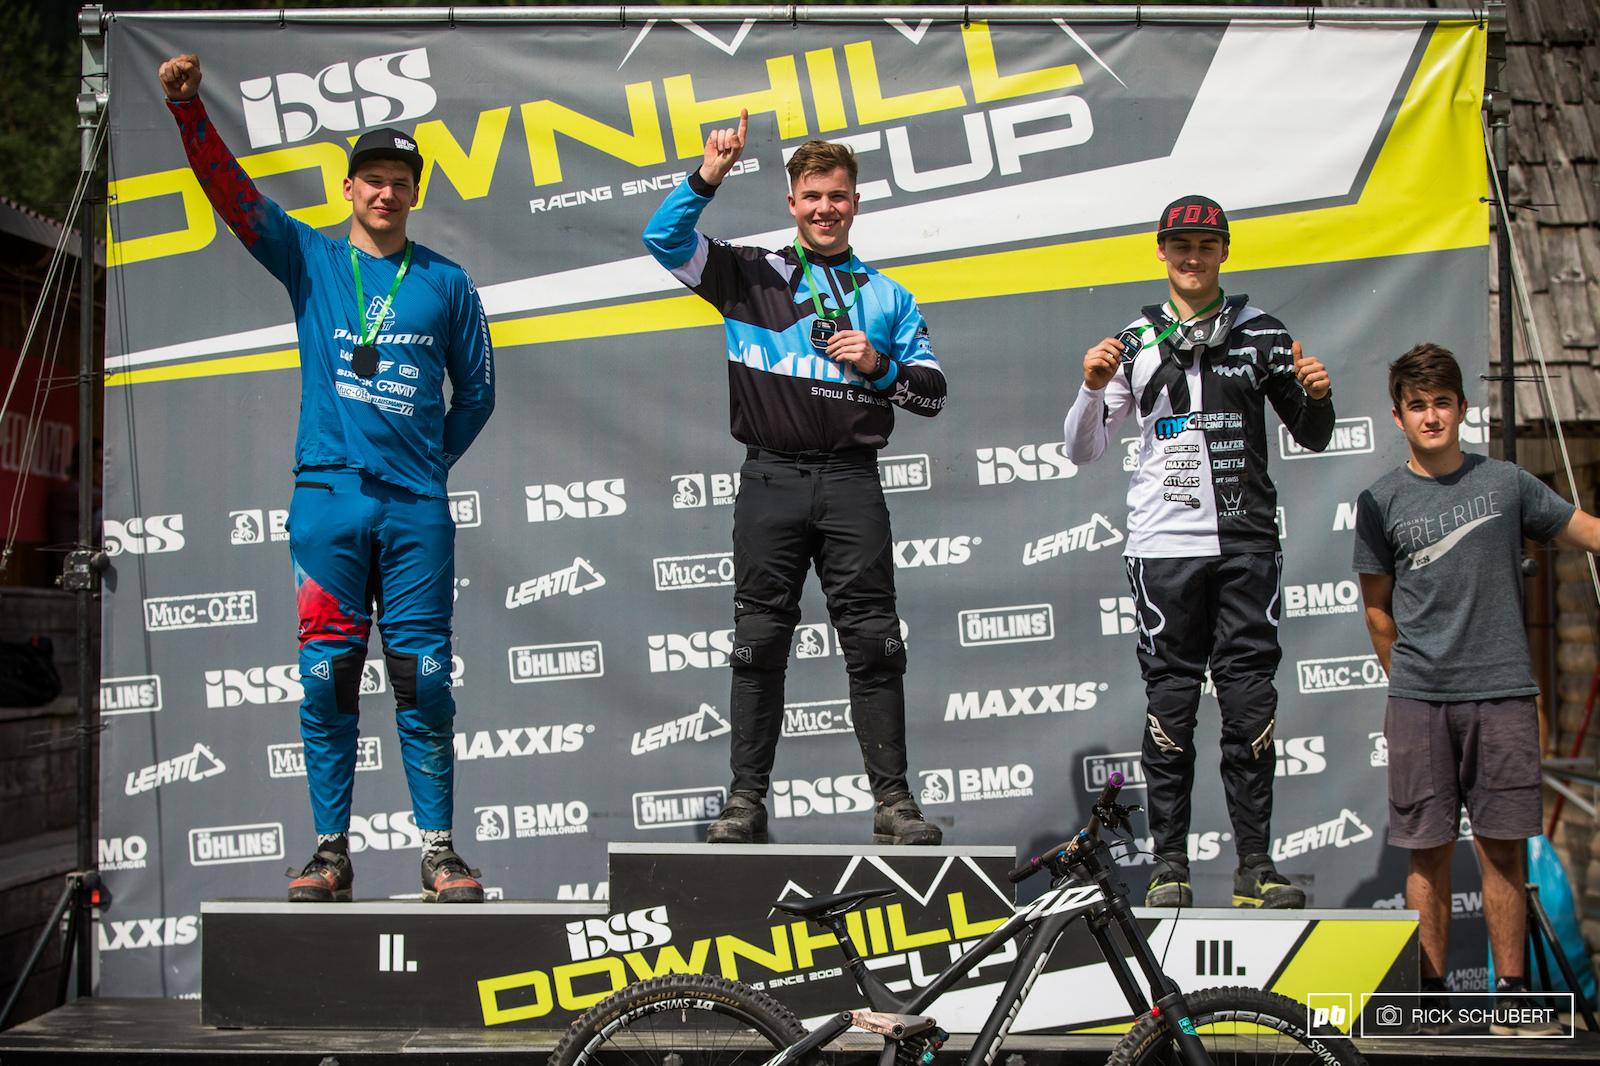 Pro U19 male podium with Marcel Merkeli Tristan Botteram Hannes Lehmann and Zak Gomilscek